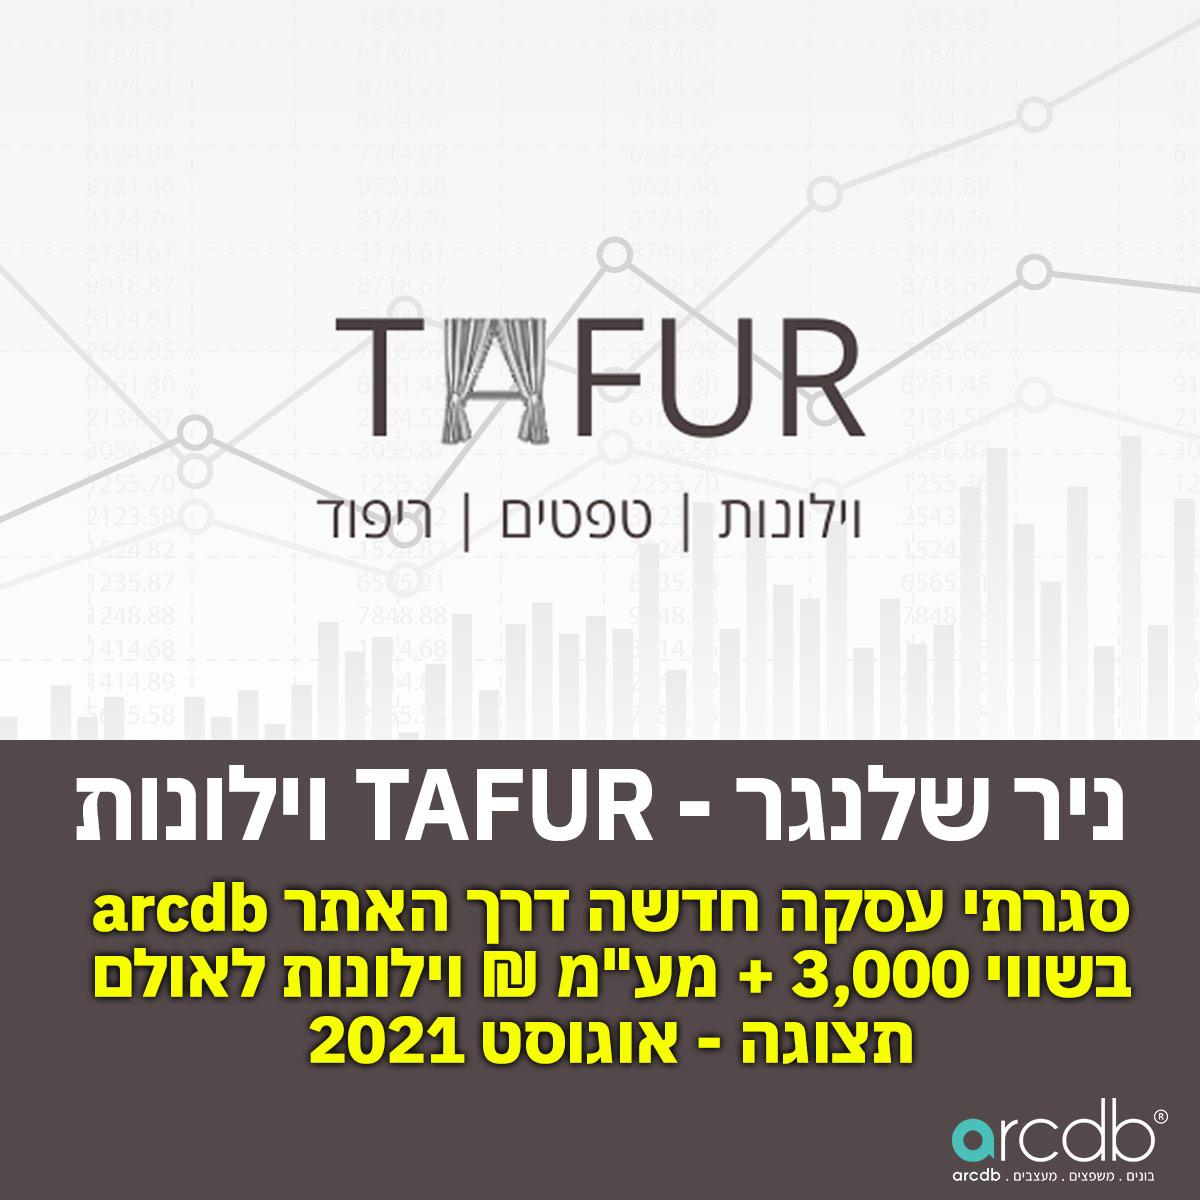 TAFUR